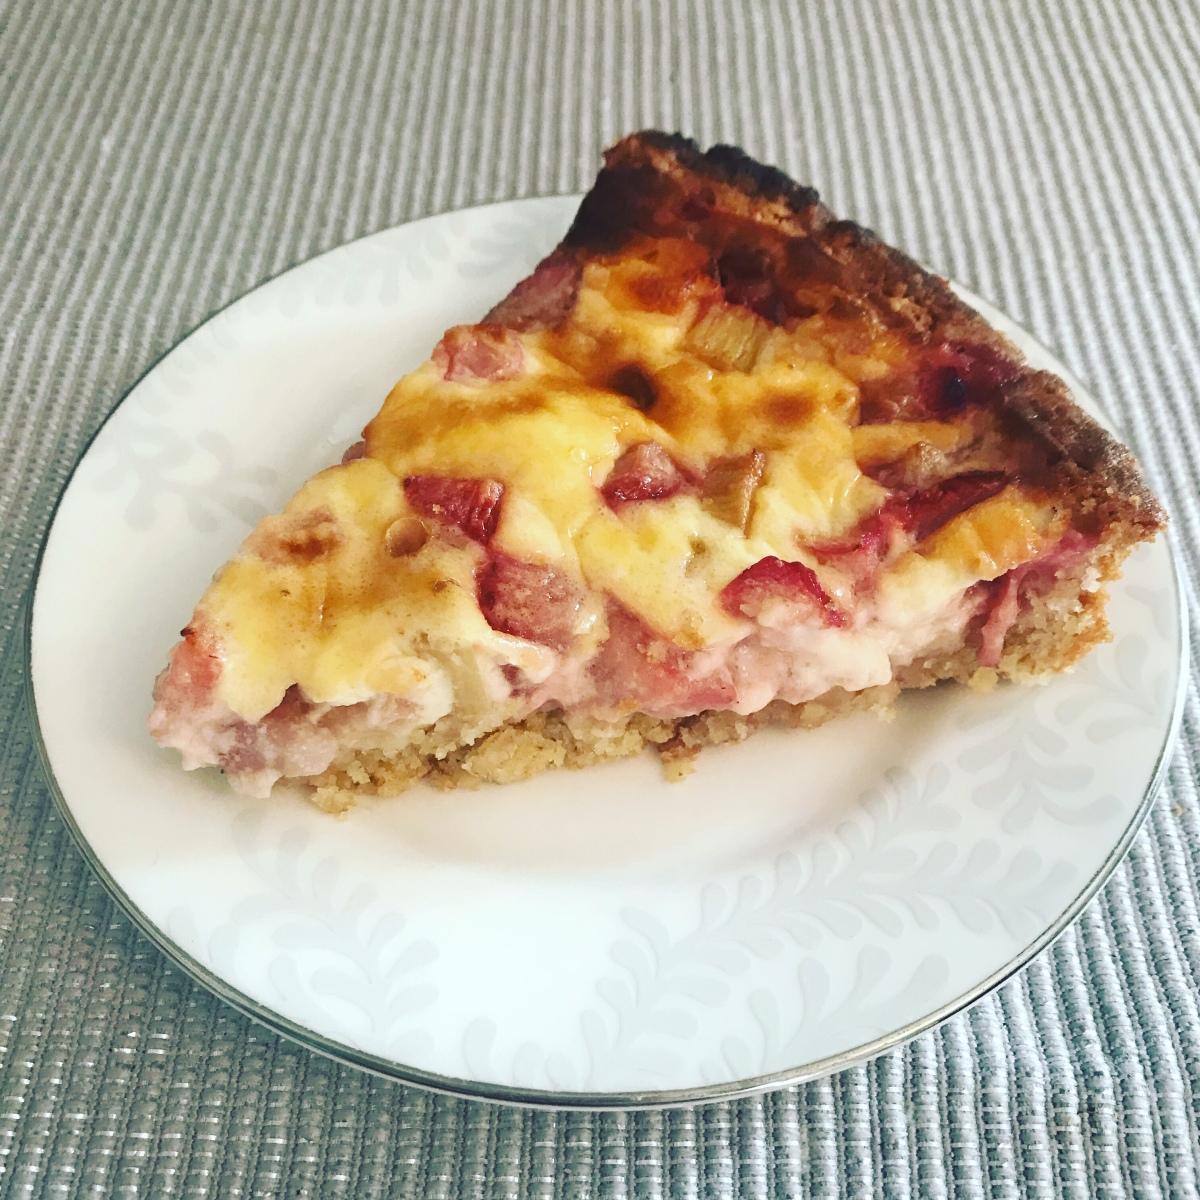 Rhubarb and strawberrytart